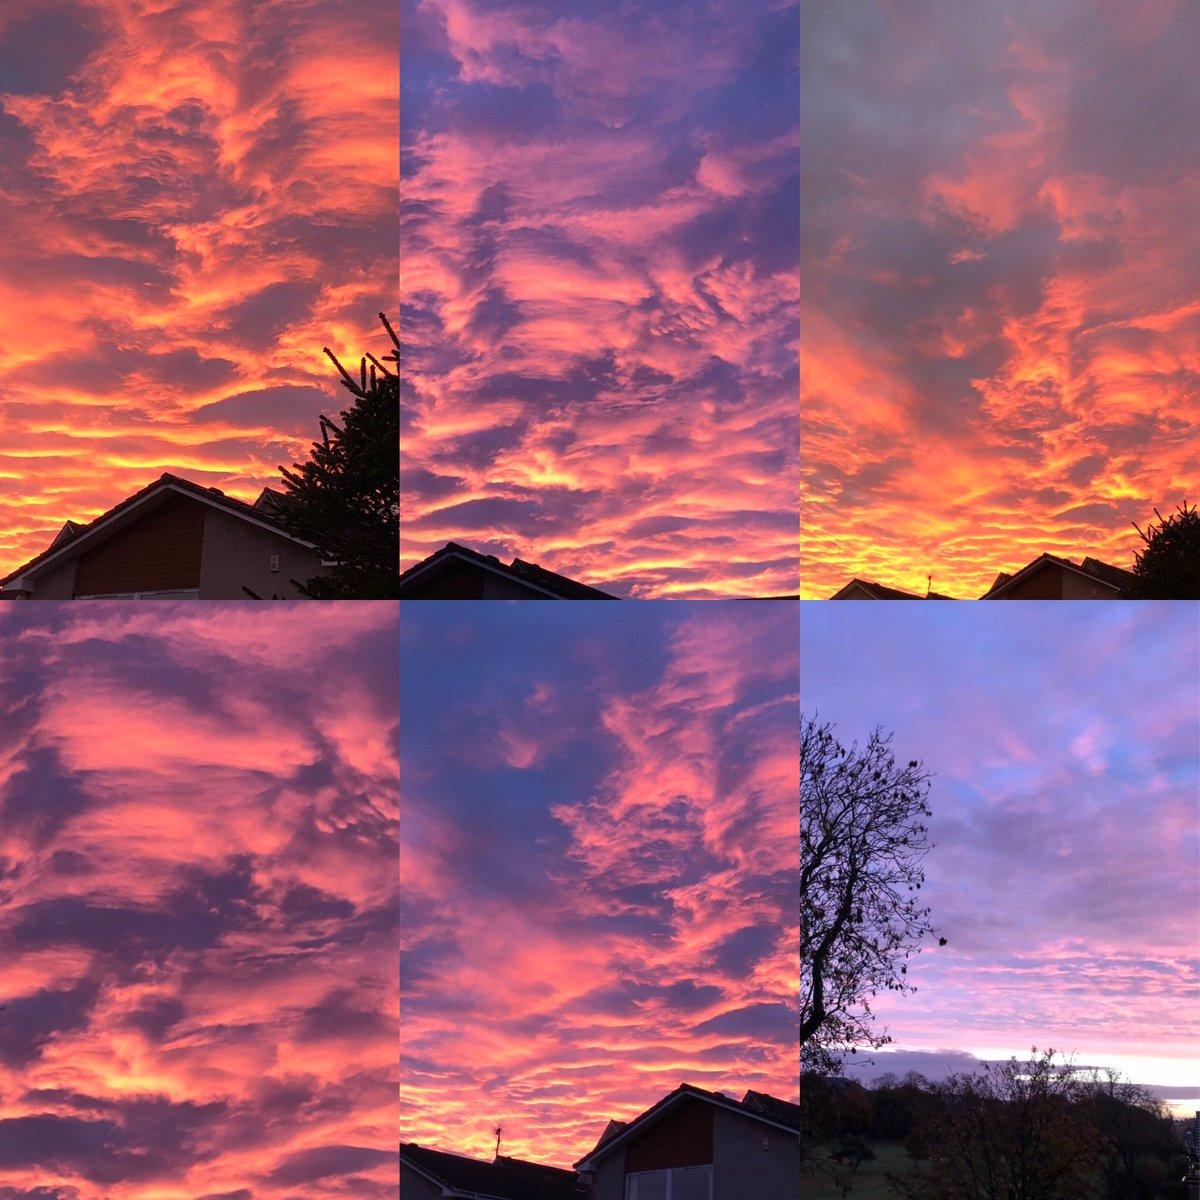 How amazing was the sunrise this morning?! 🤩 #sunrise https://t.co/mEgIrCVvEP